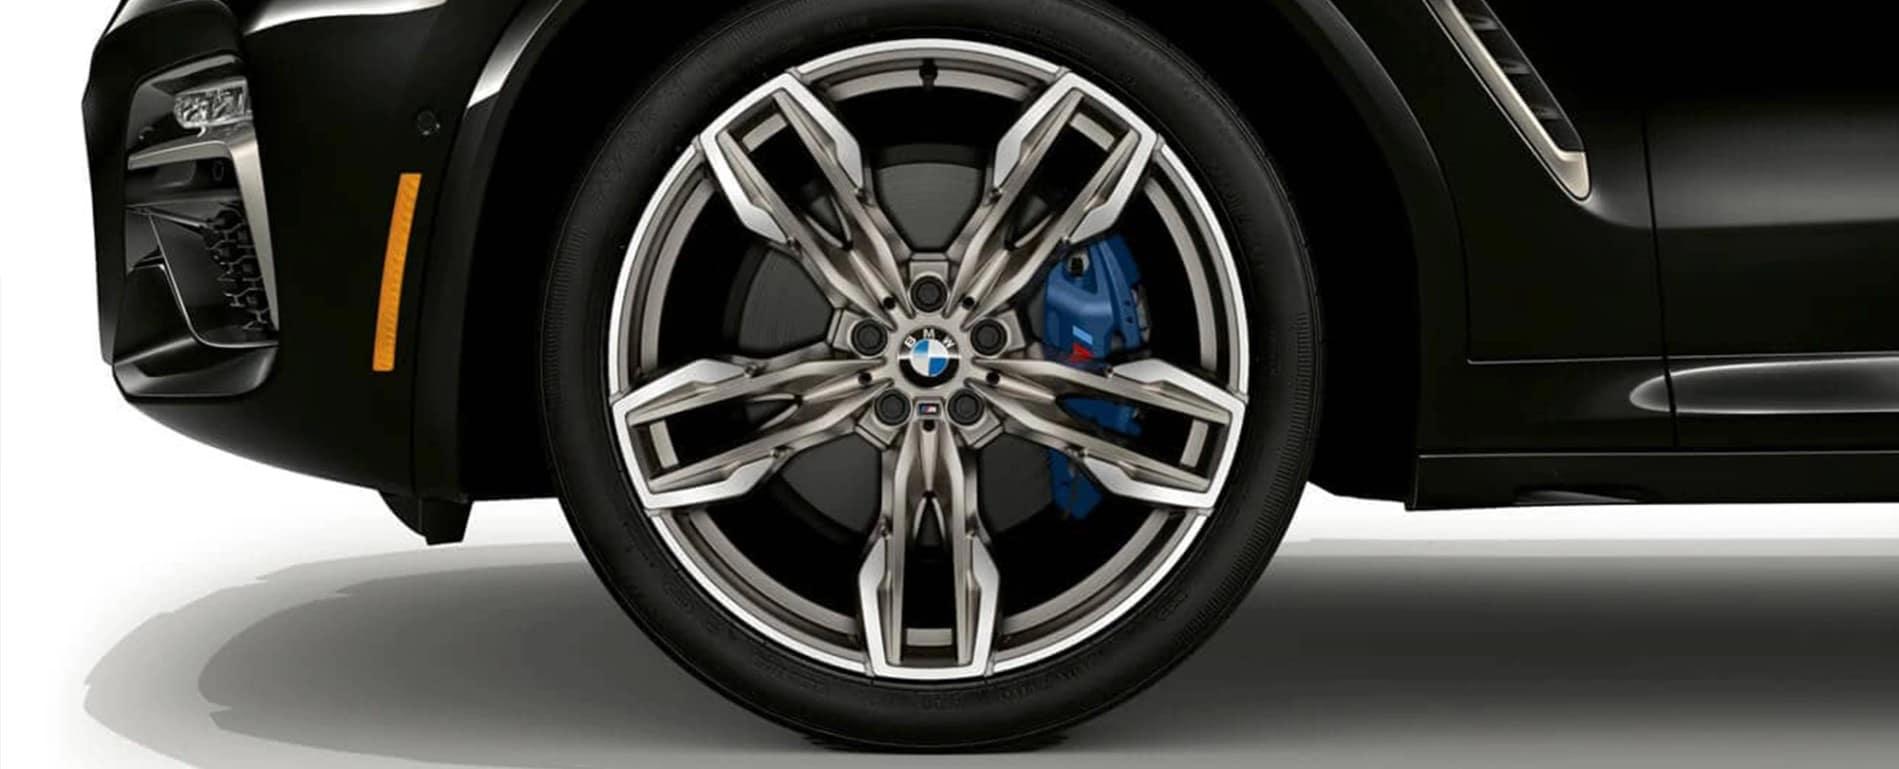 BMW Tire Maintenance Service